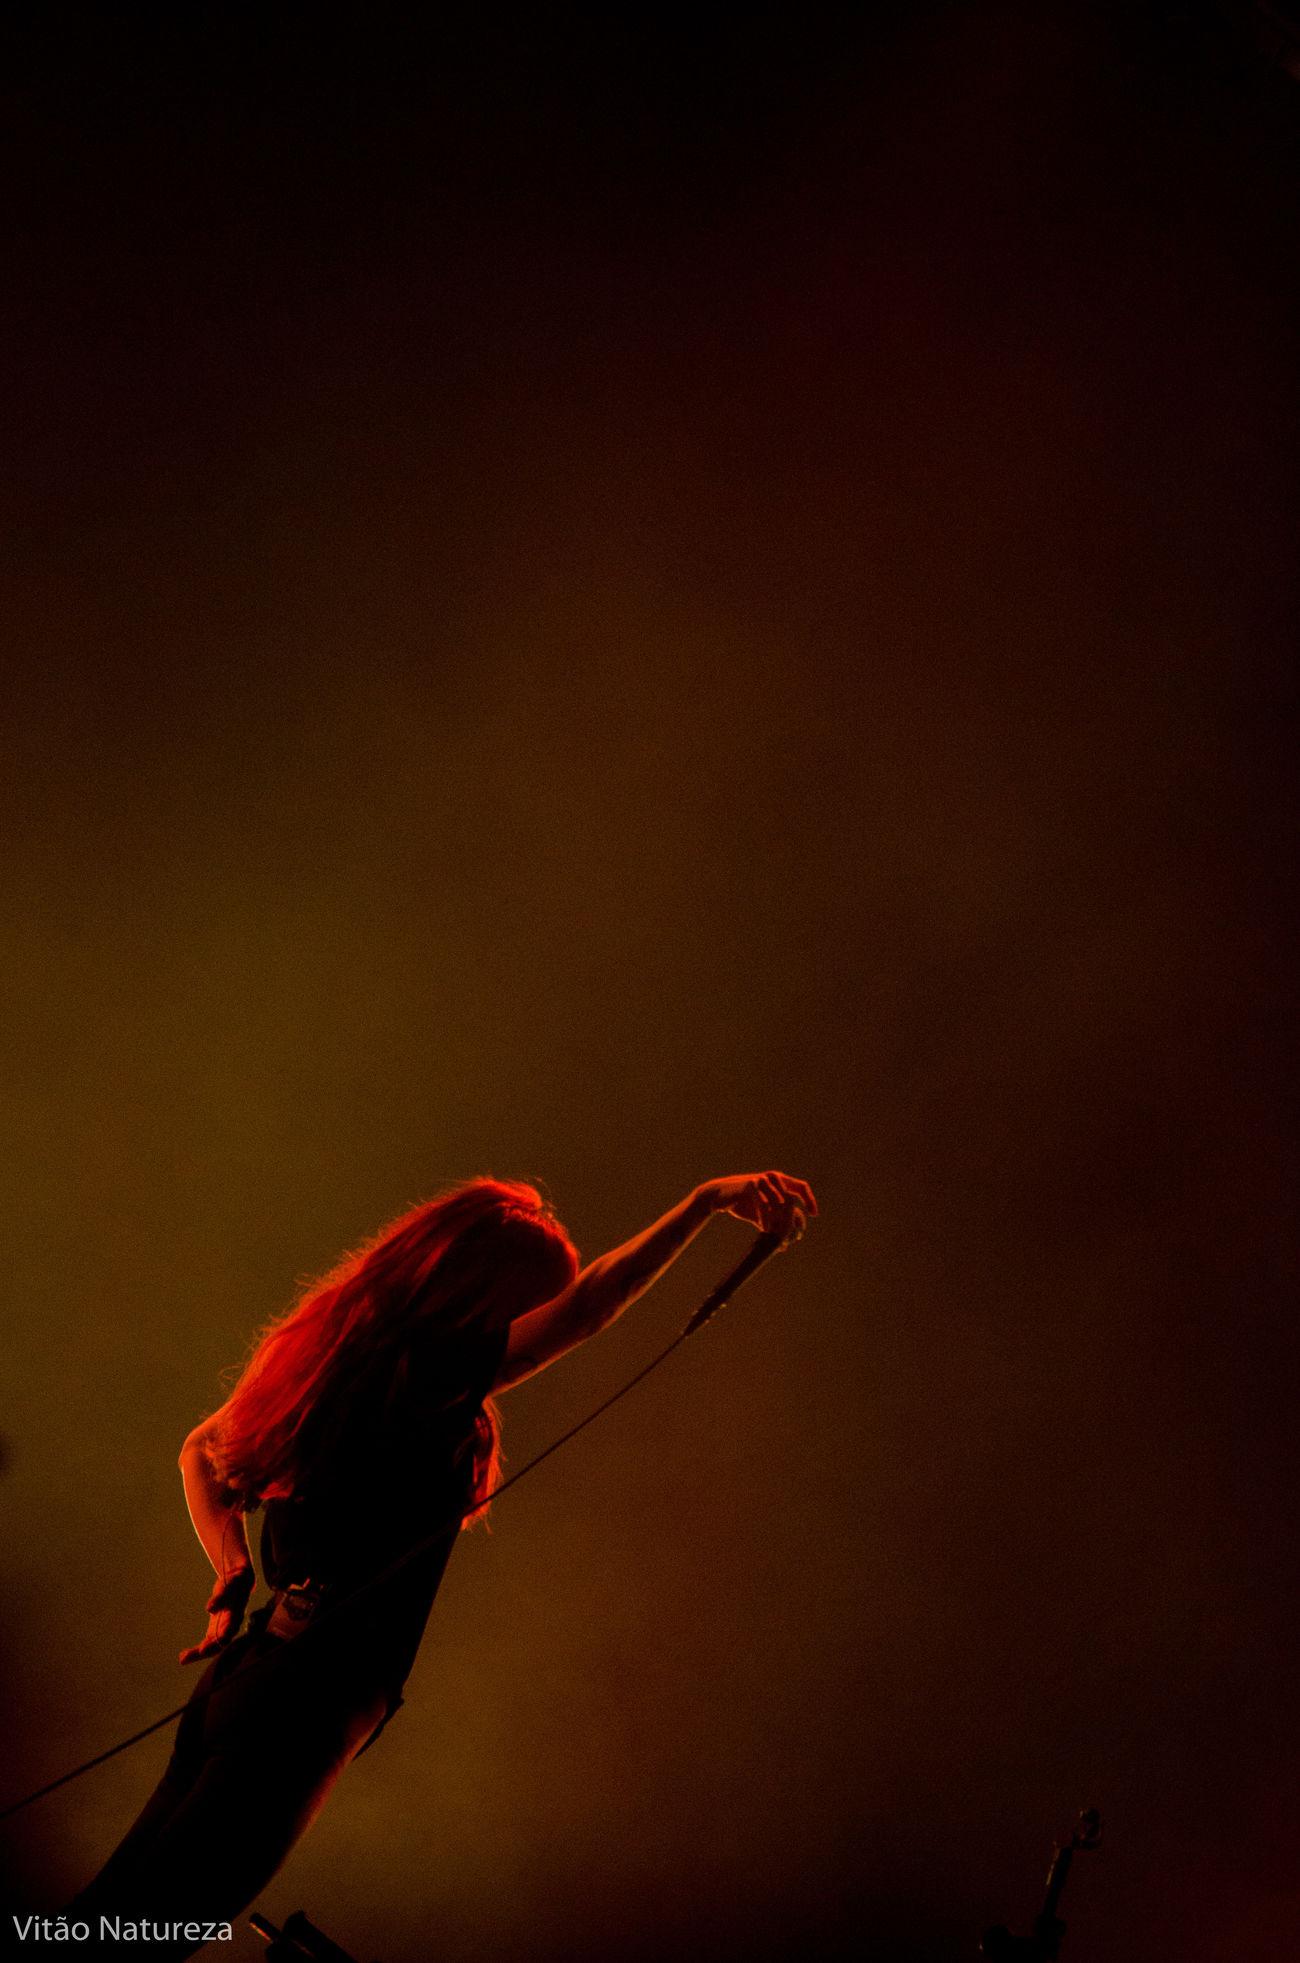 Pitty Rock Musica Rocknacional Show Planetarock Victornatureza Vitaonatureza Olharnatural